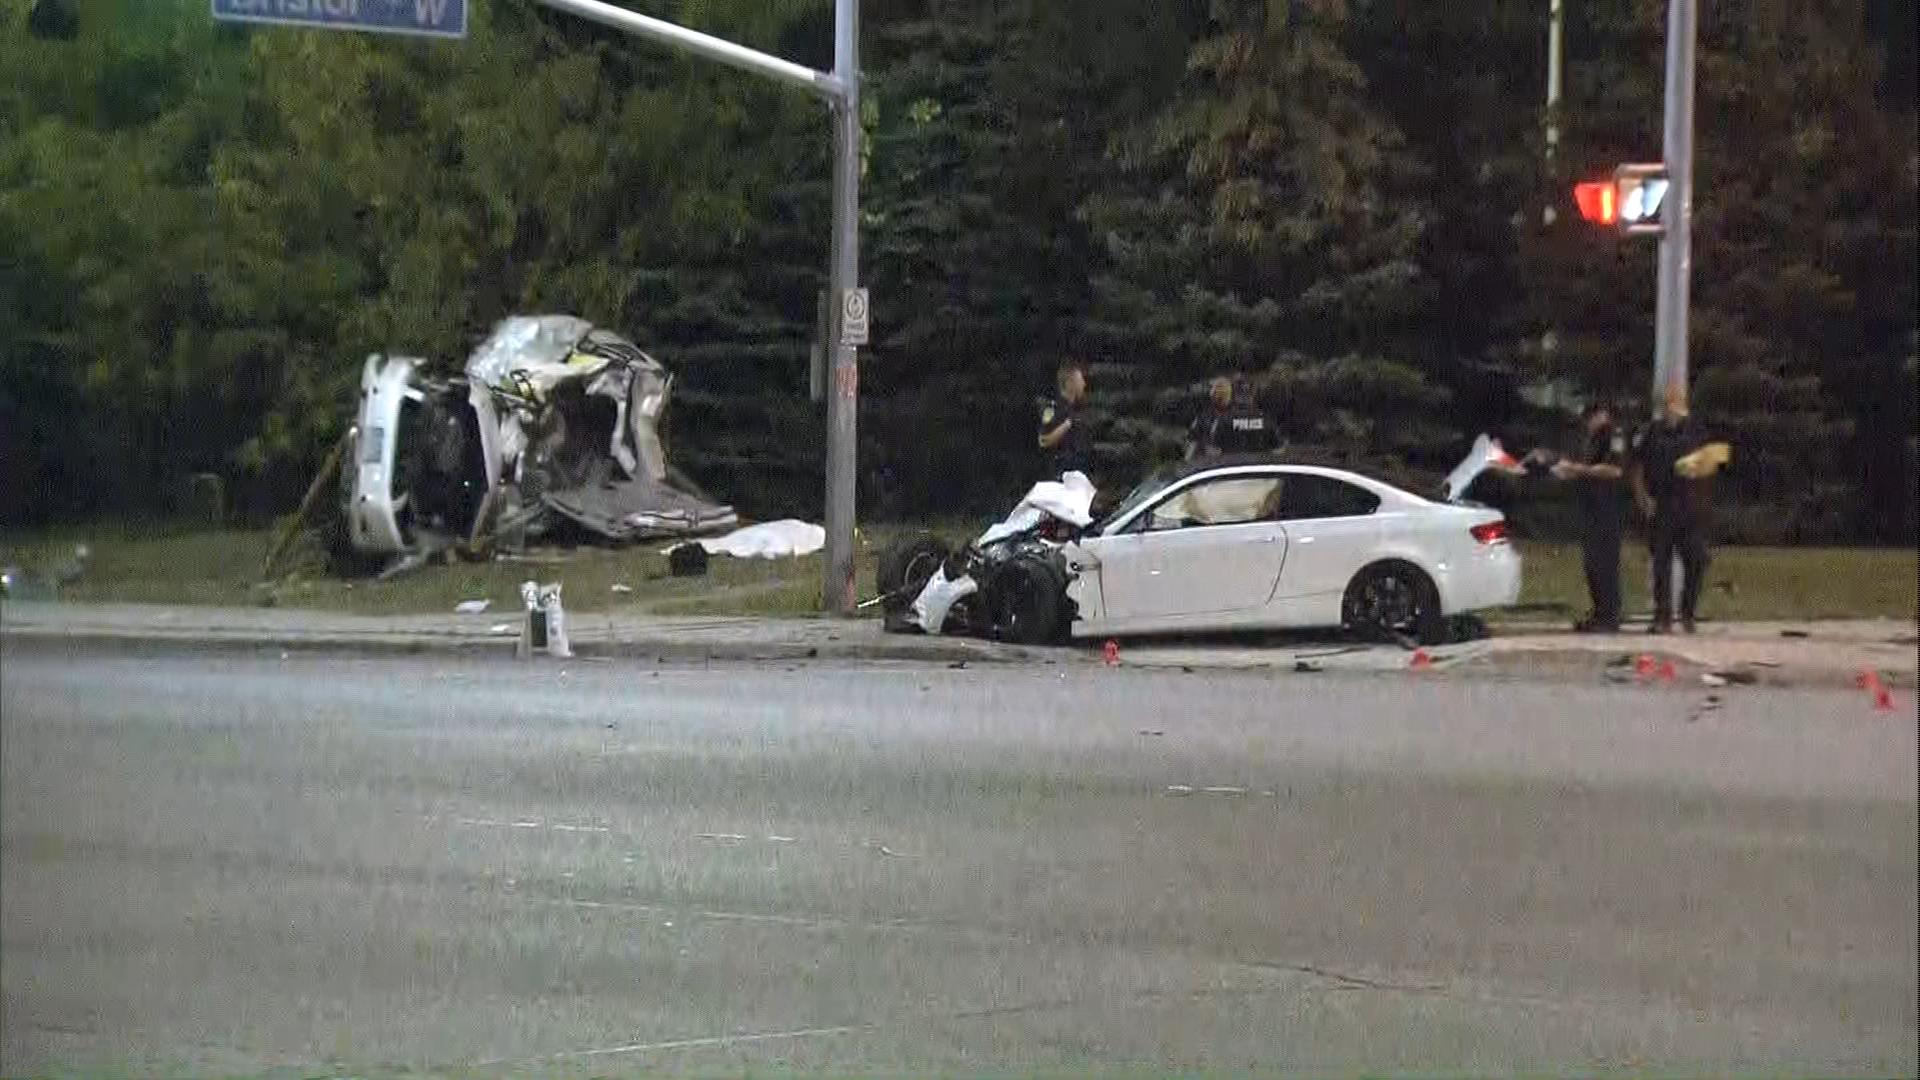 Peel police investigate a fatal crash at Mavis and Bristol roads in Mississauga on Sept. 14, 2017. CITYNEWS